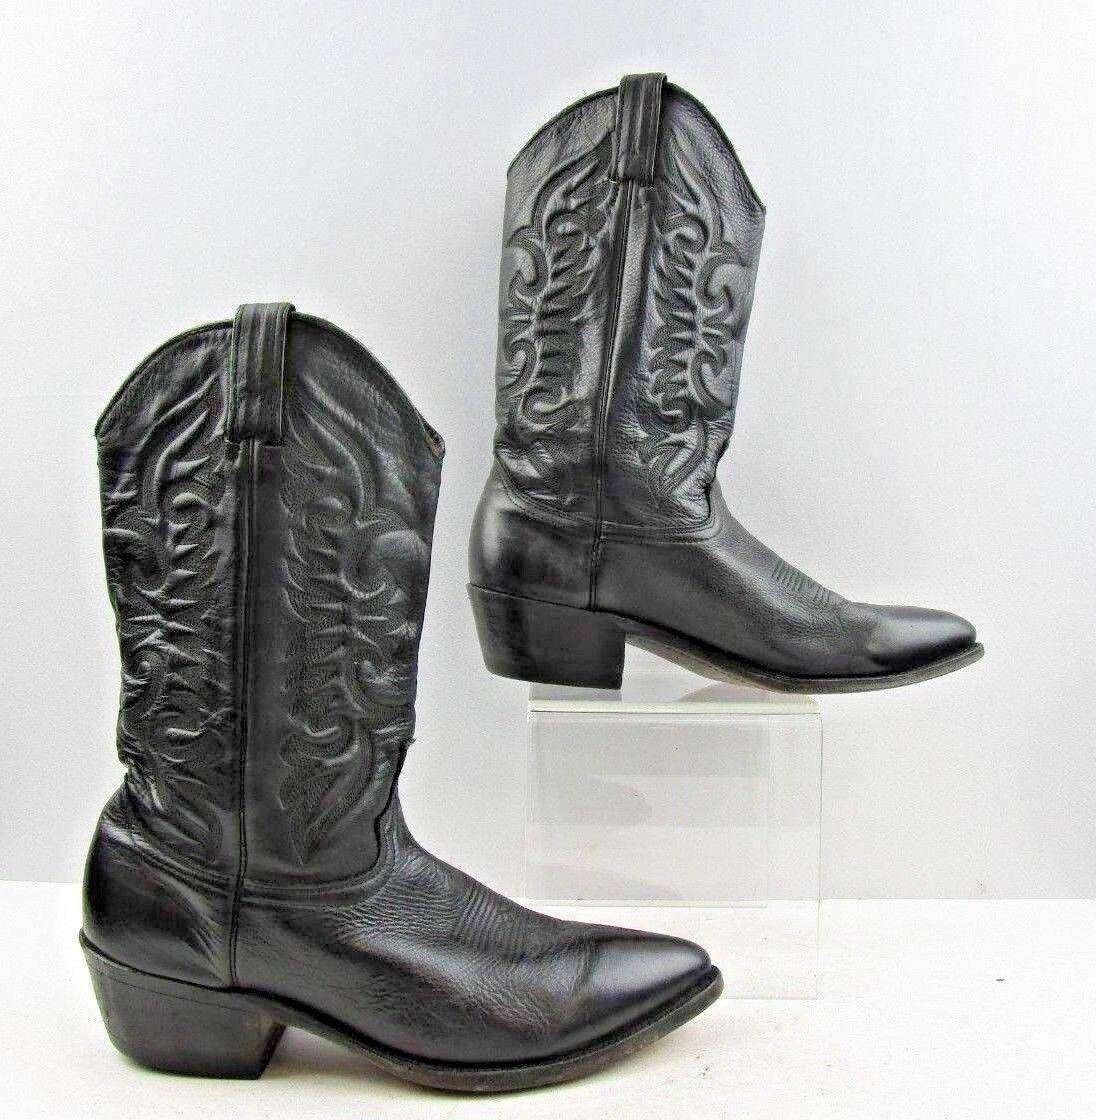 Men's Abilene Black Leather Soft Pointed Toe Cowboy Western Boots Size  9.5 D